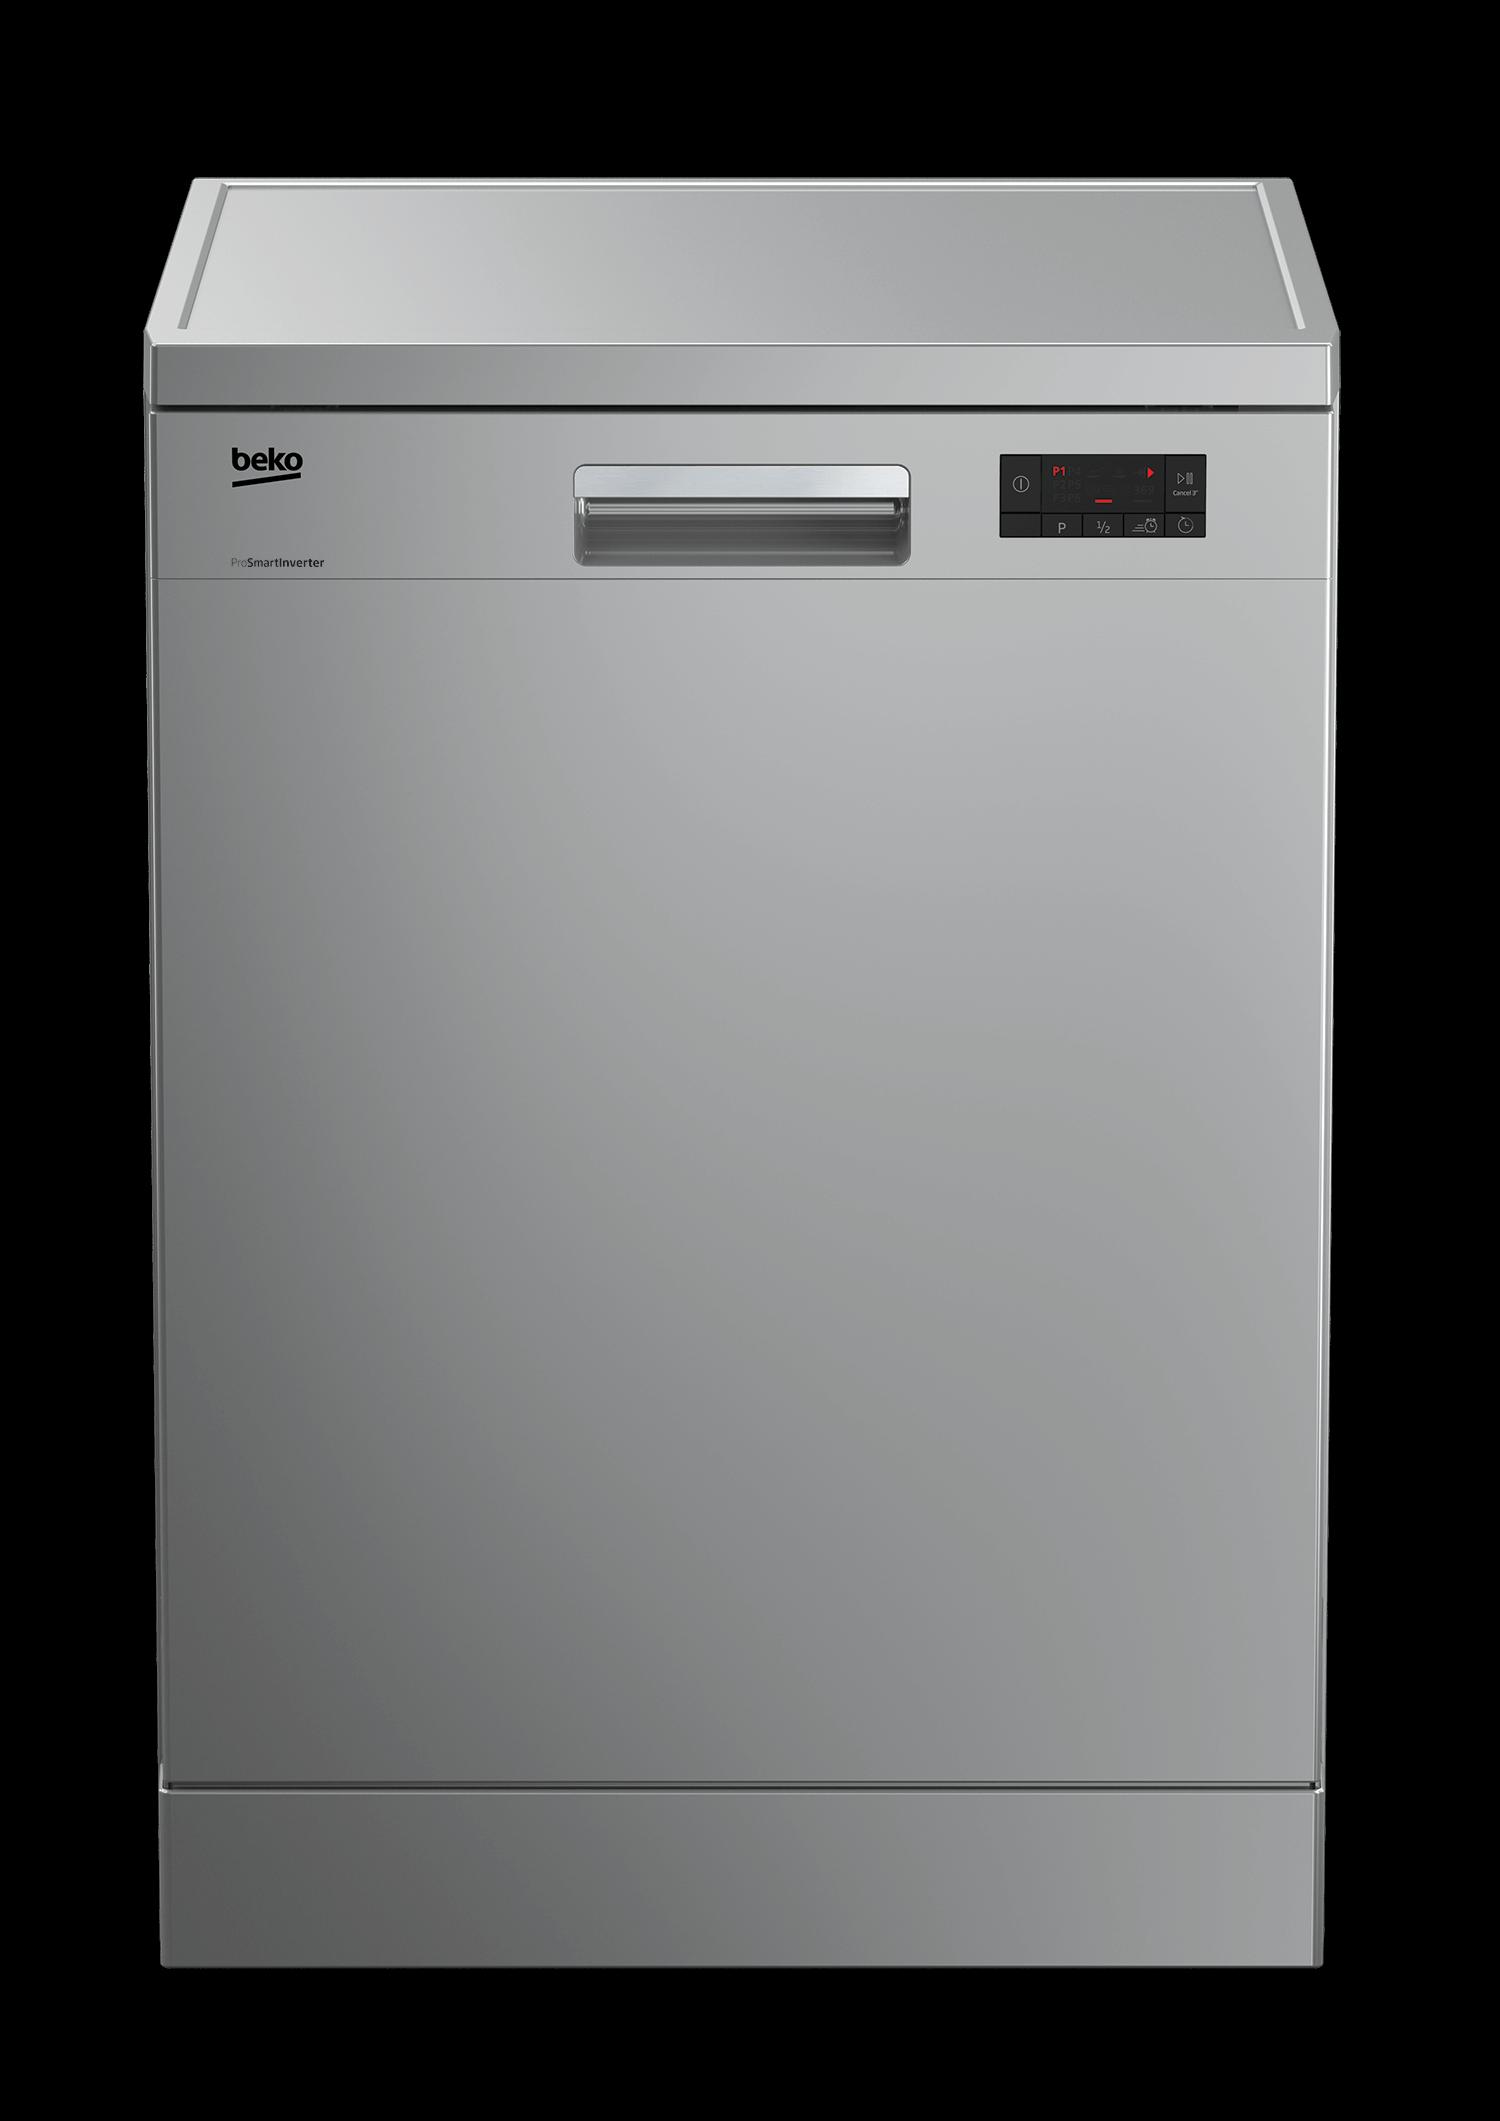 BEKO 6 Programmes Dishwasher DFN16421S